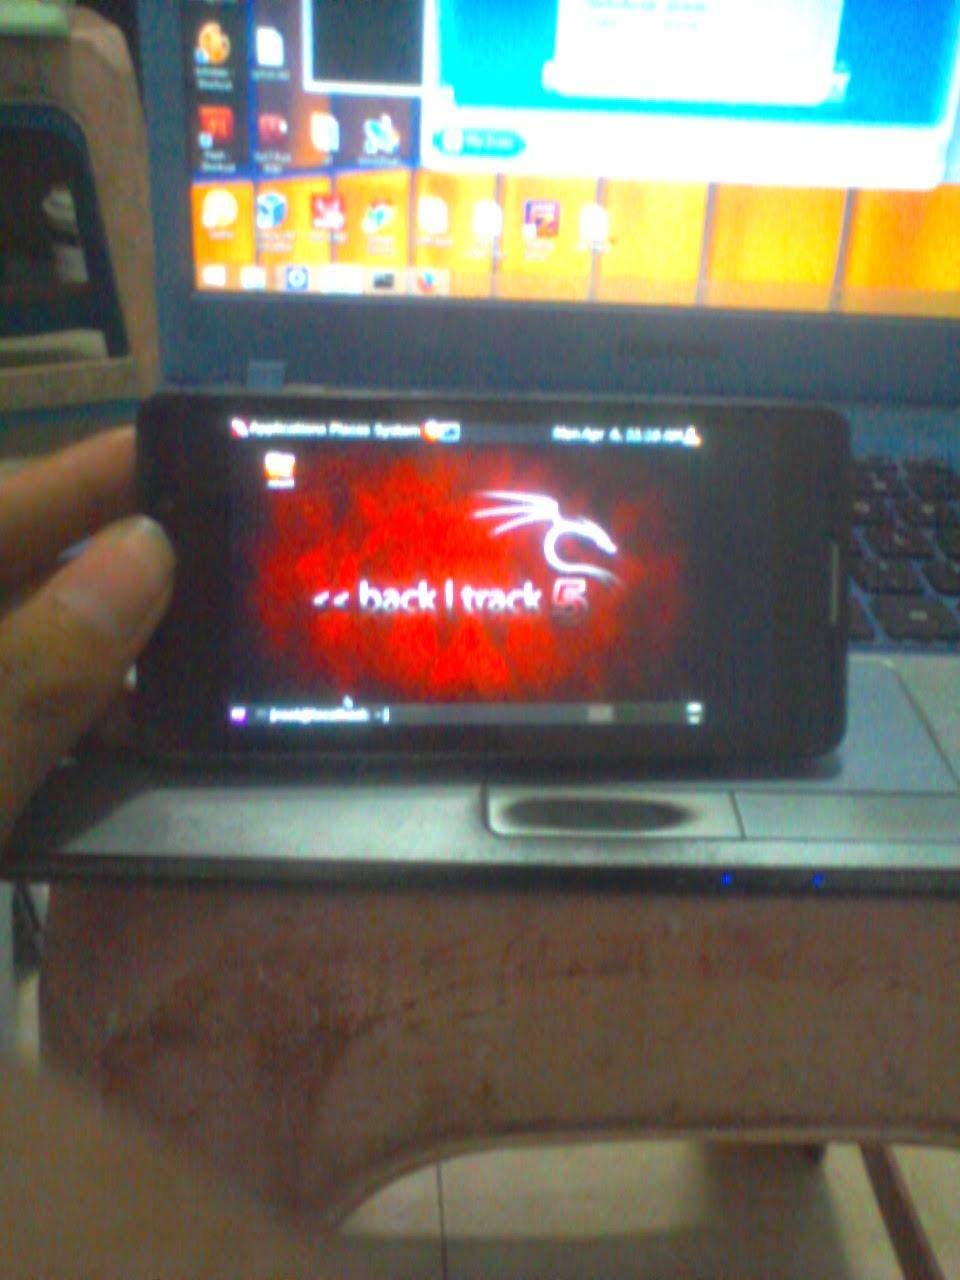 Cara Install Backtrack 5 Linux dan Kali Linux di Android